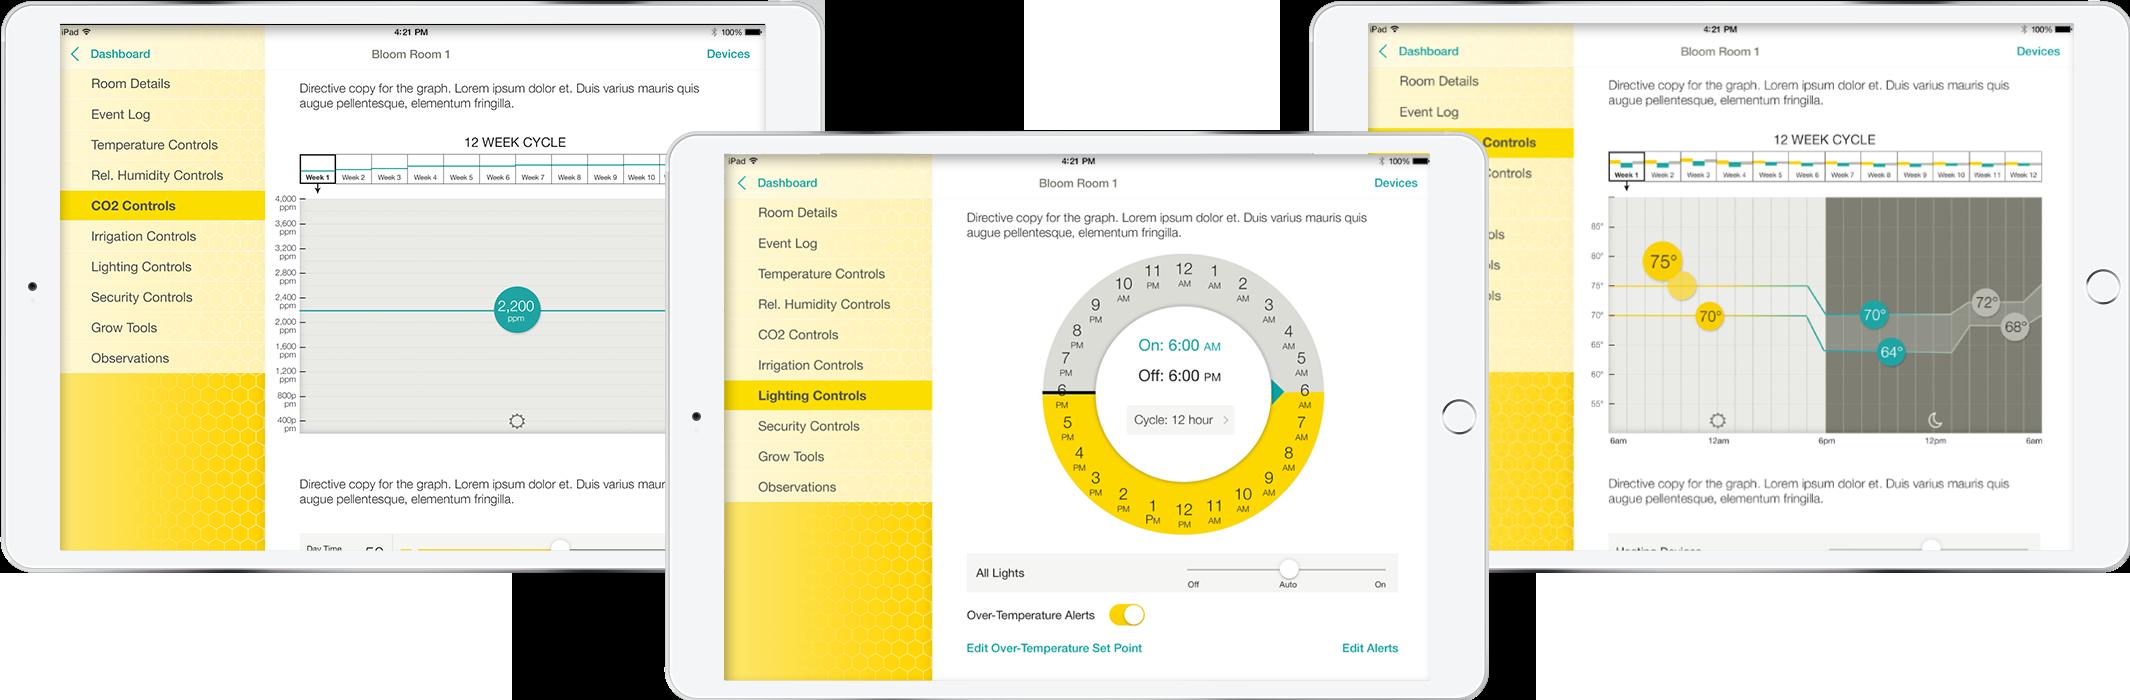 Finished development of IoT application: iPads exhibit mechanisms of Swarm's farming app